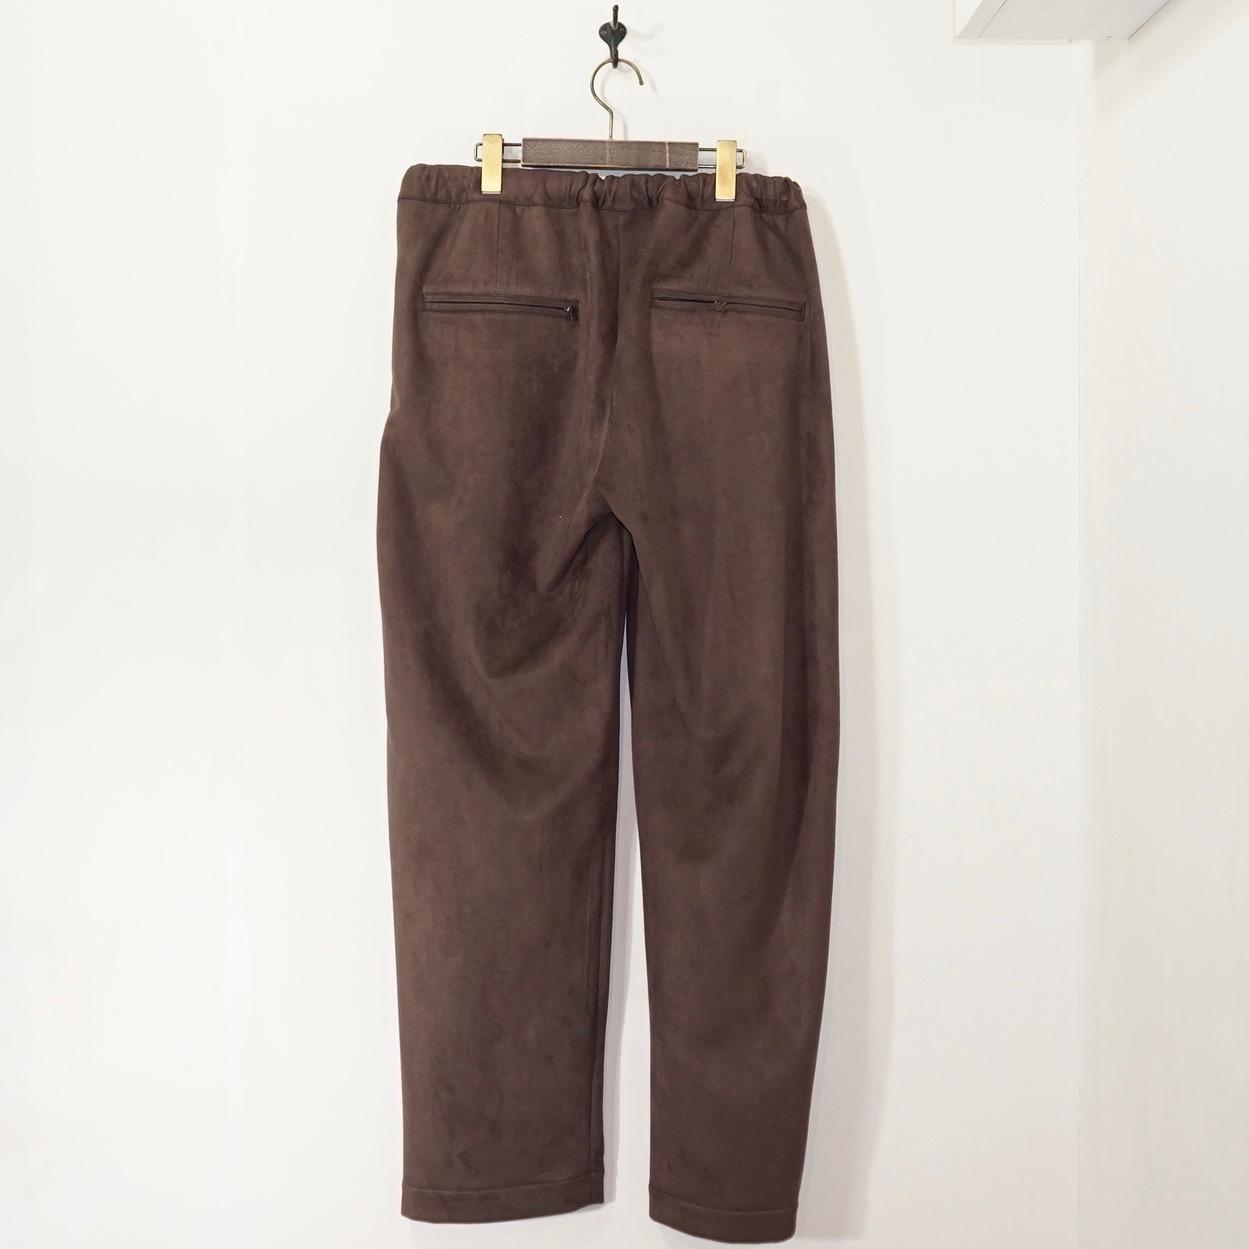 Sasquatchfabrix.(サスクワァッチファブリックス) | FAKE SUEDE TRAINING PANTS (フェイクスェードトレーニングパンツ) - BROWN